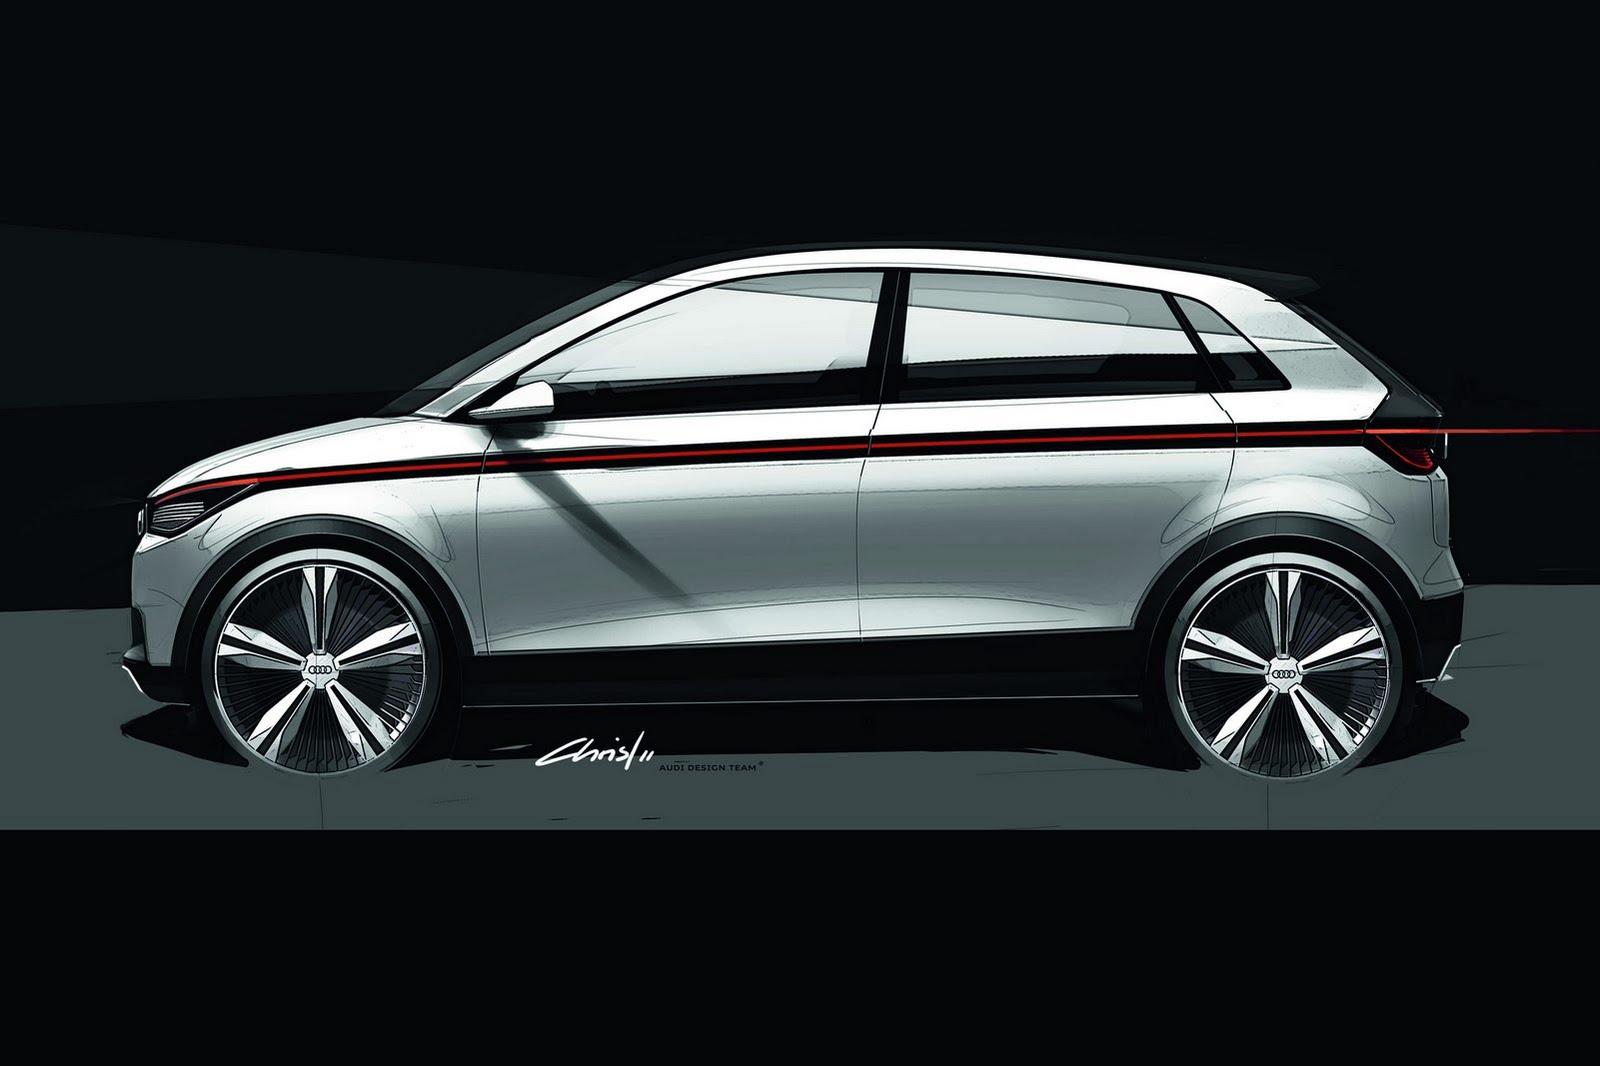 High Resolution Wallpaper | Audi A2 Concept 1600x1066 px